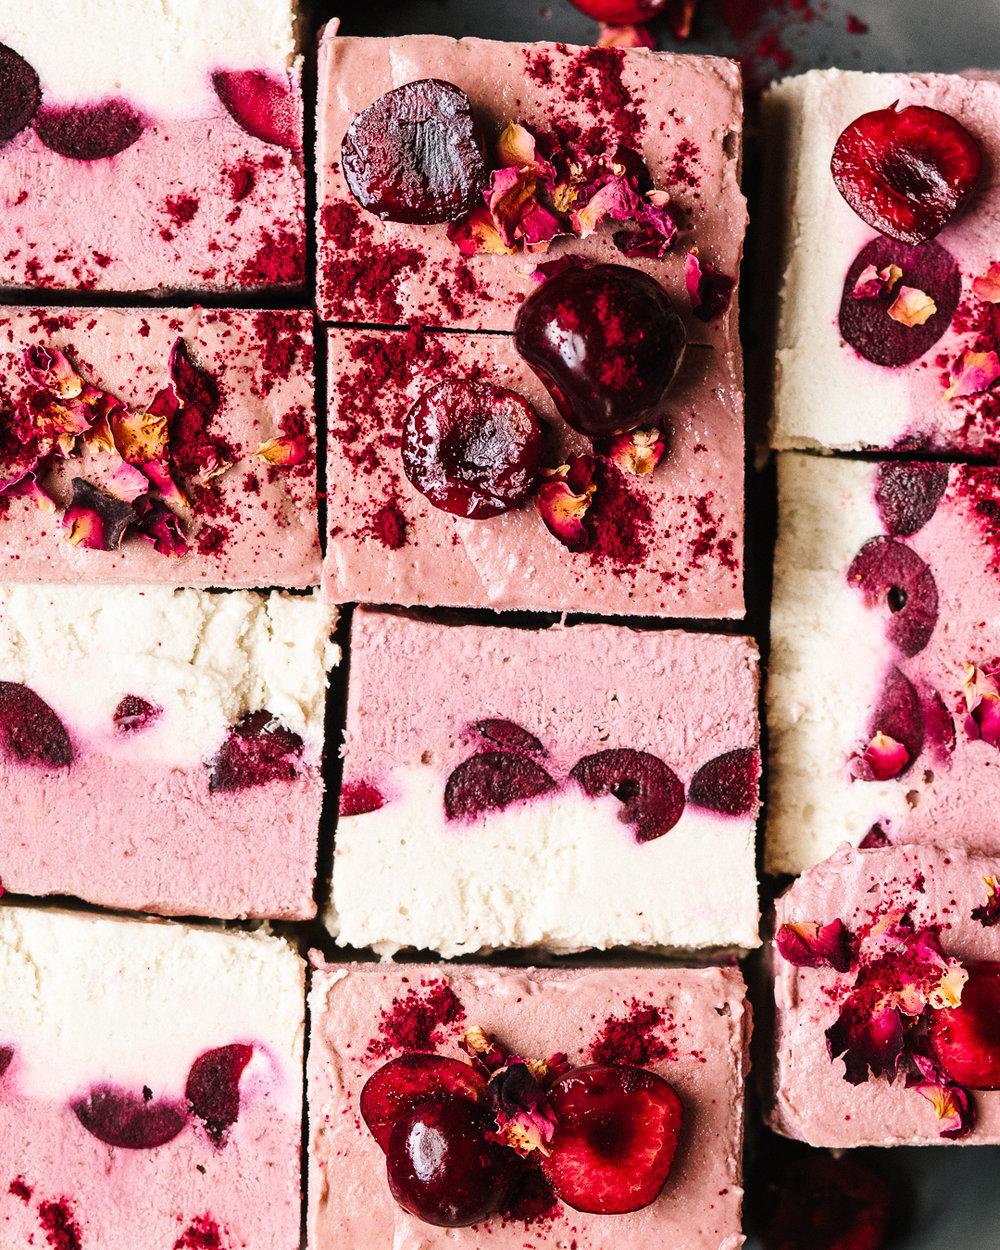 Cherry_Vanilla_Cheesecake_by_Jordan_Pie_Nutritionist_Photographer-1.jpg